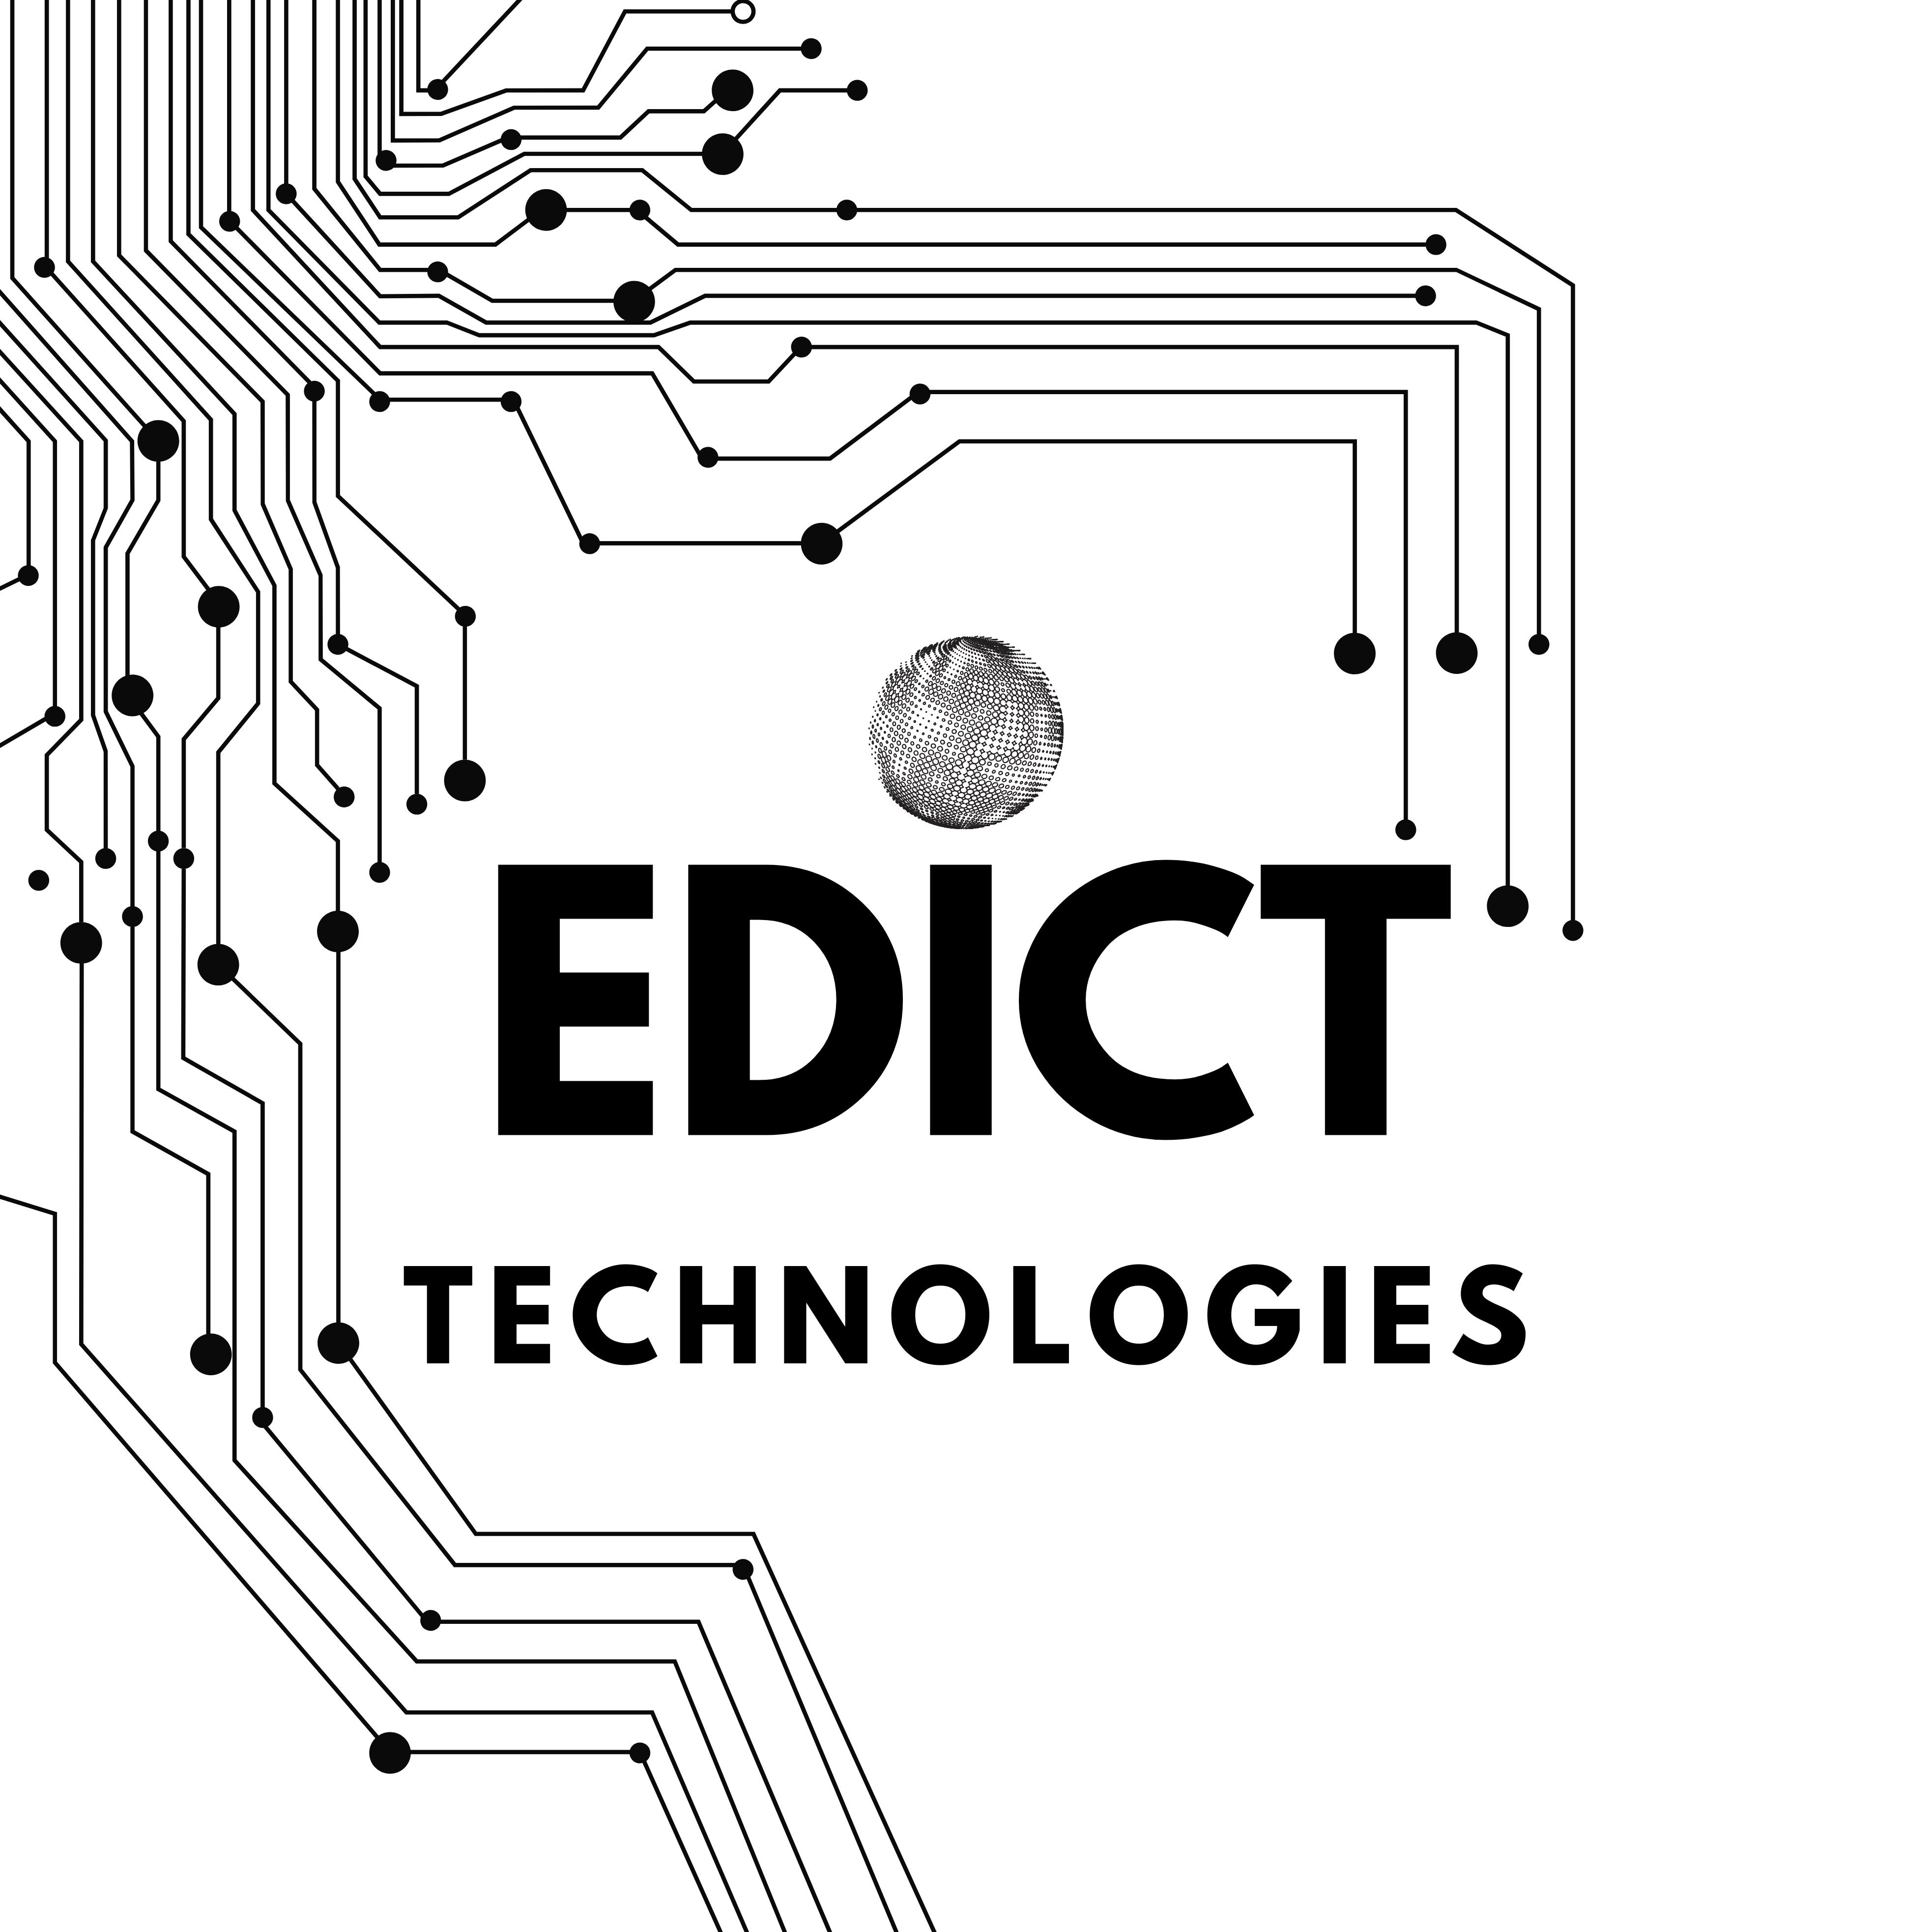 Edict Technologies